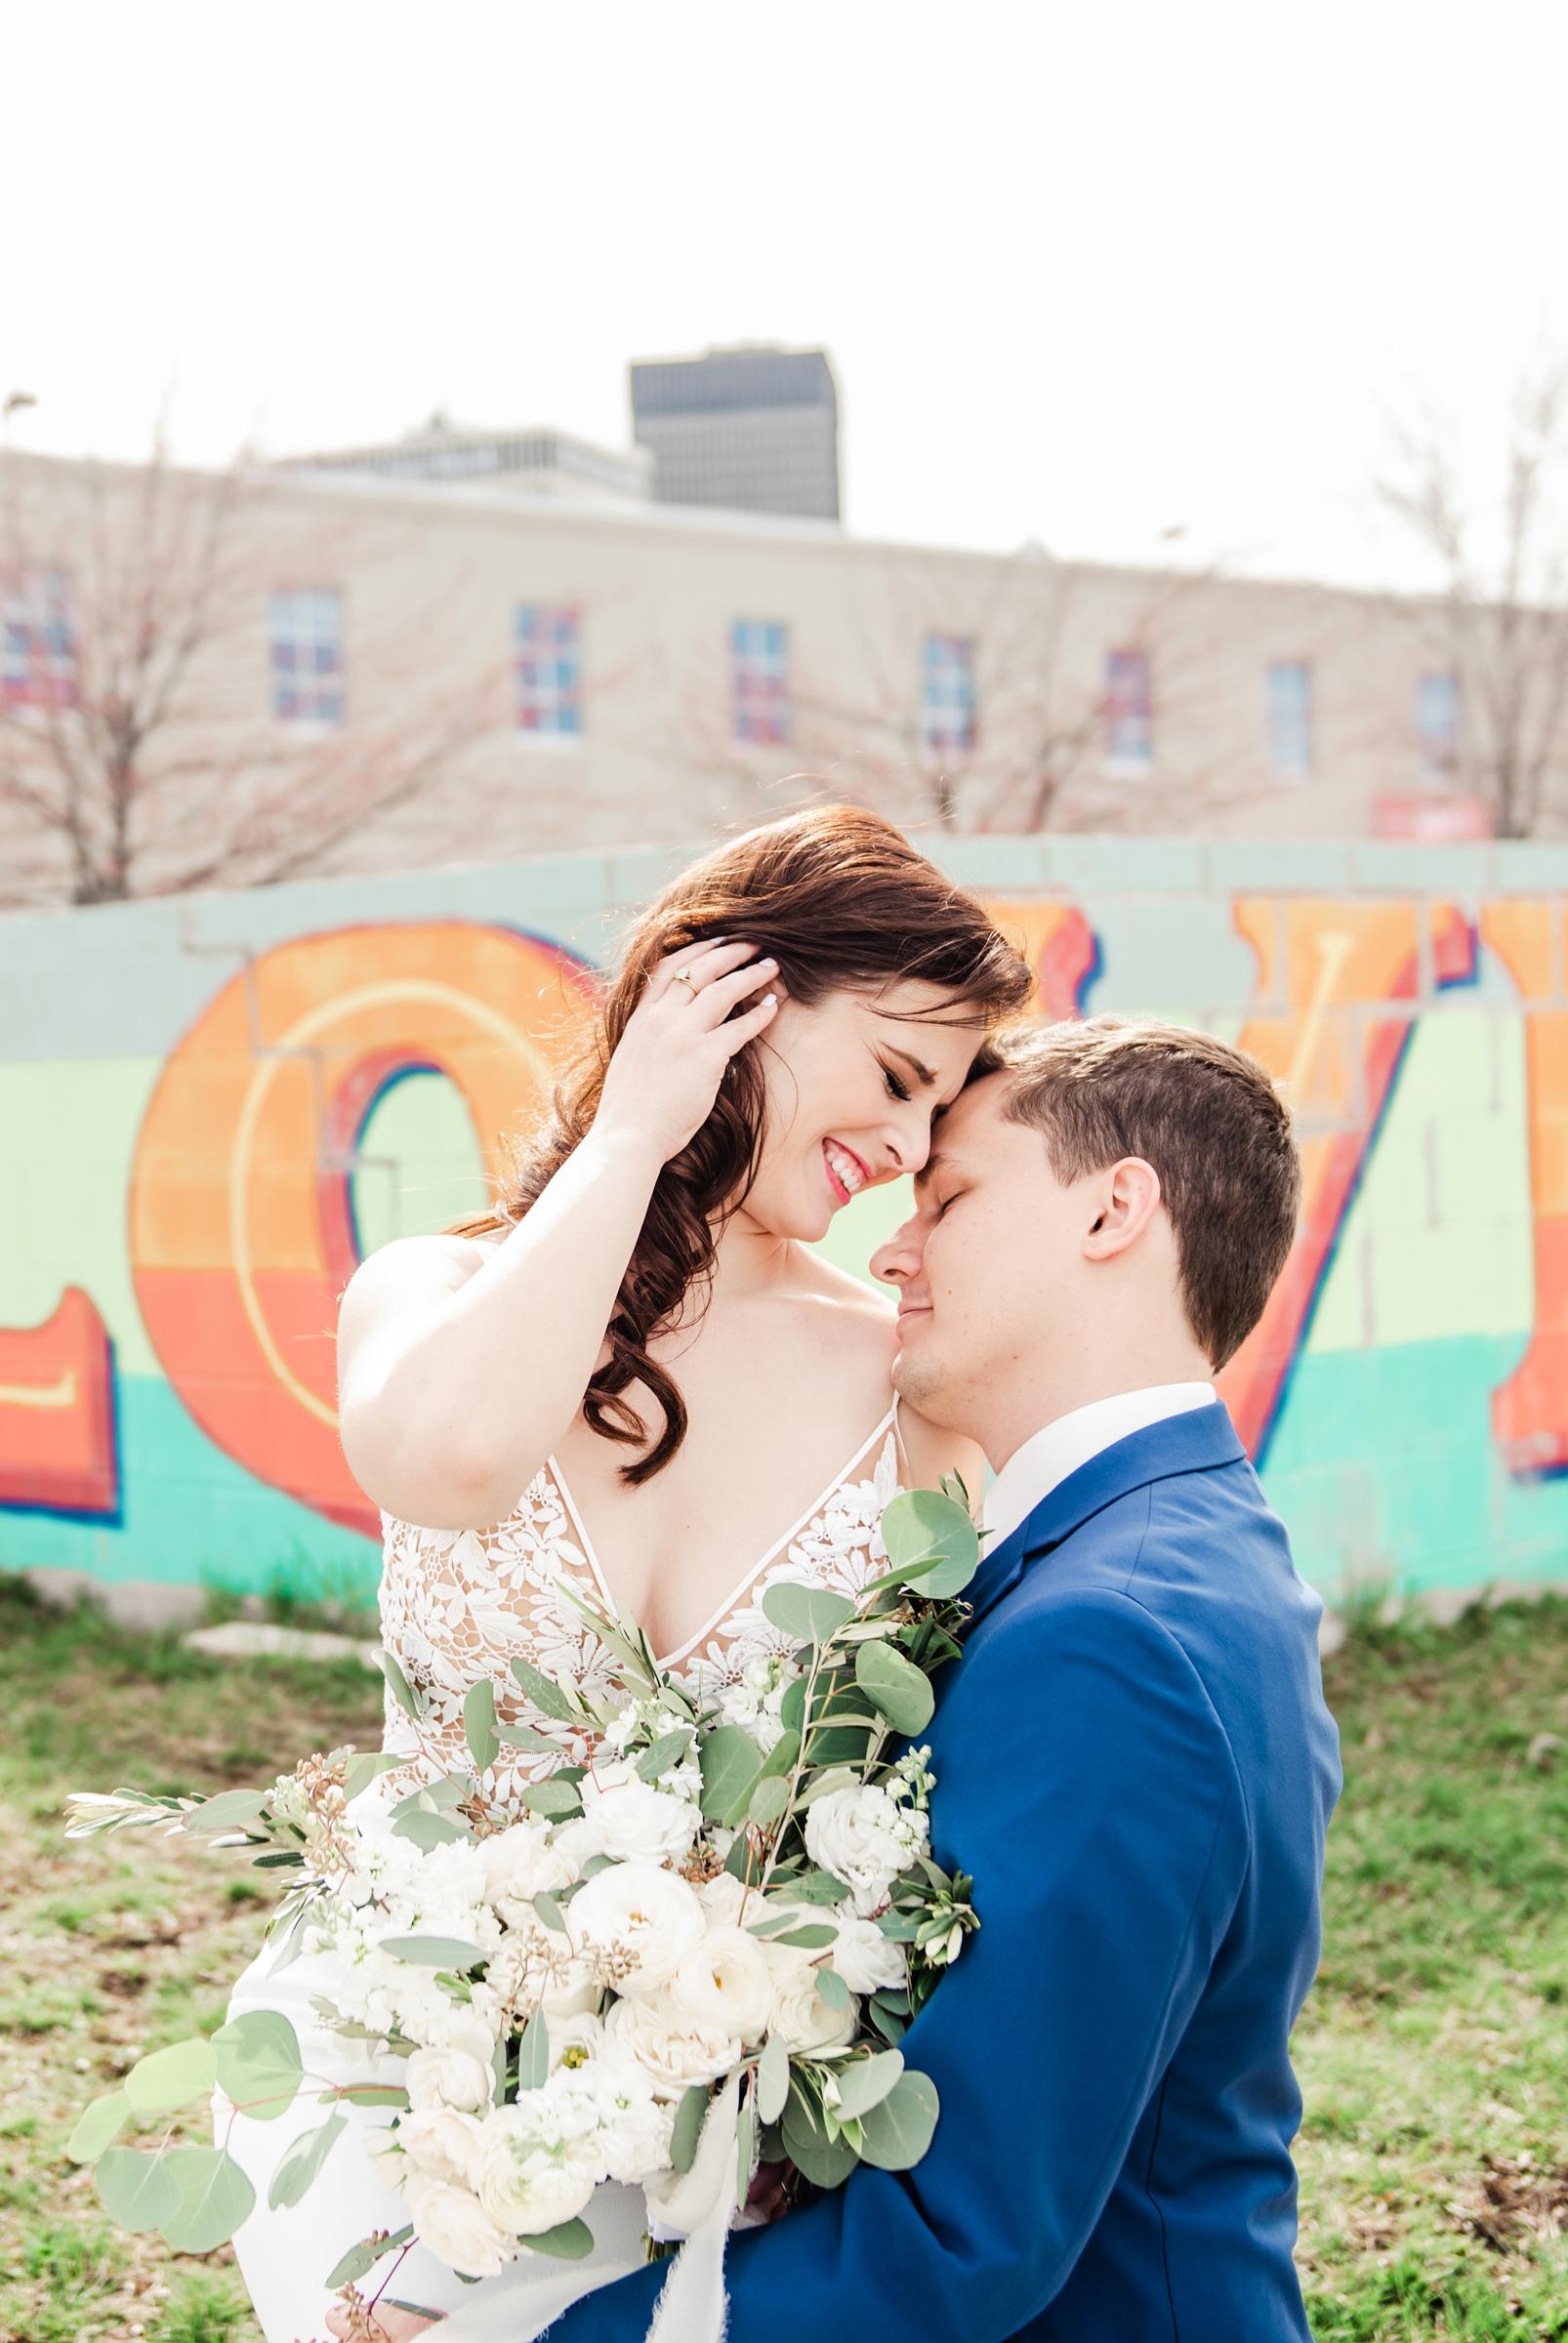 The_Arbor_LoftRochester_Wedding_JILL_STUDIO_Rochester_NY_Photographer_160740.jpg